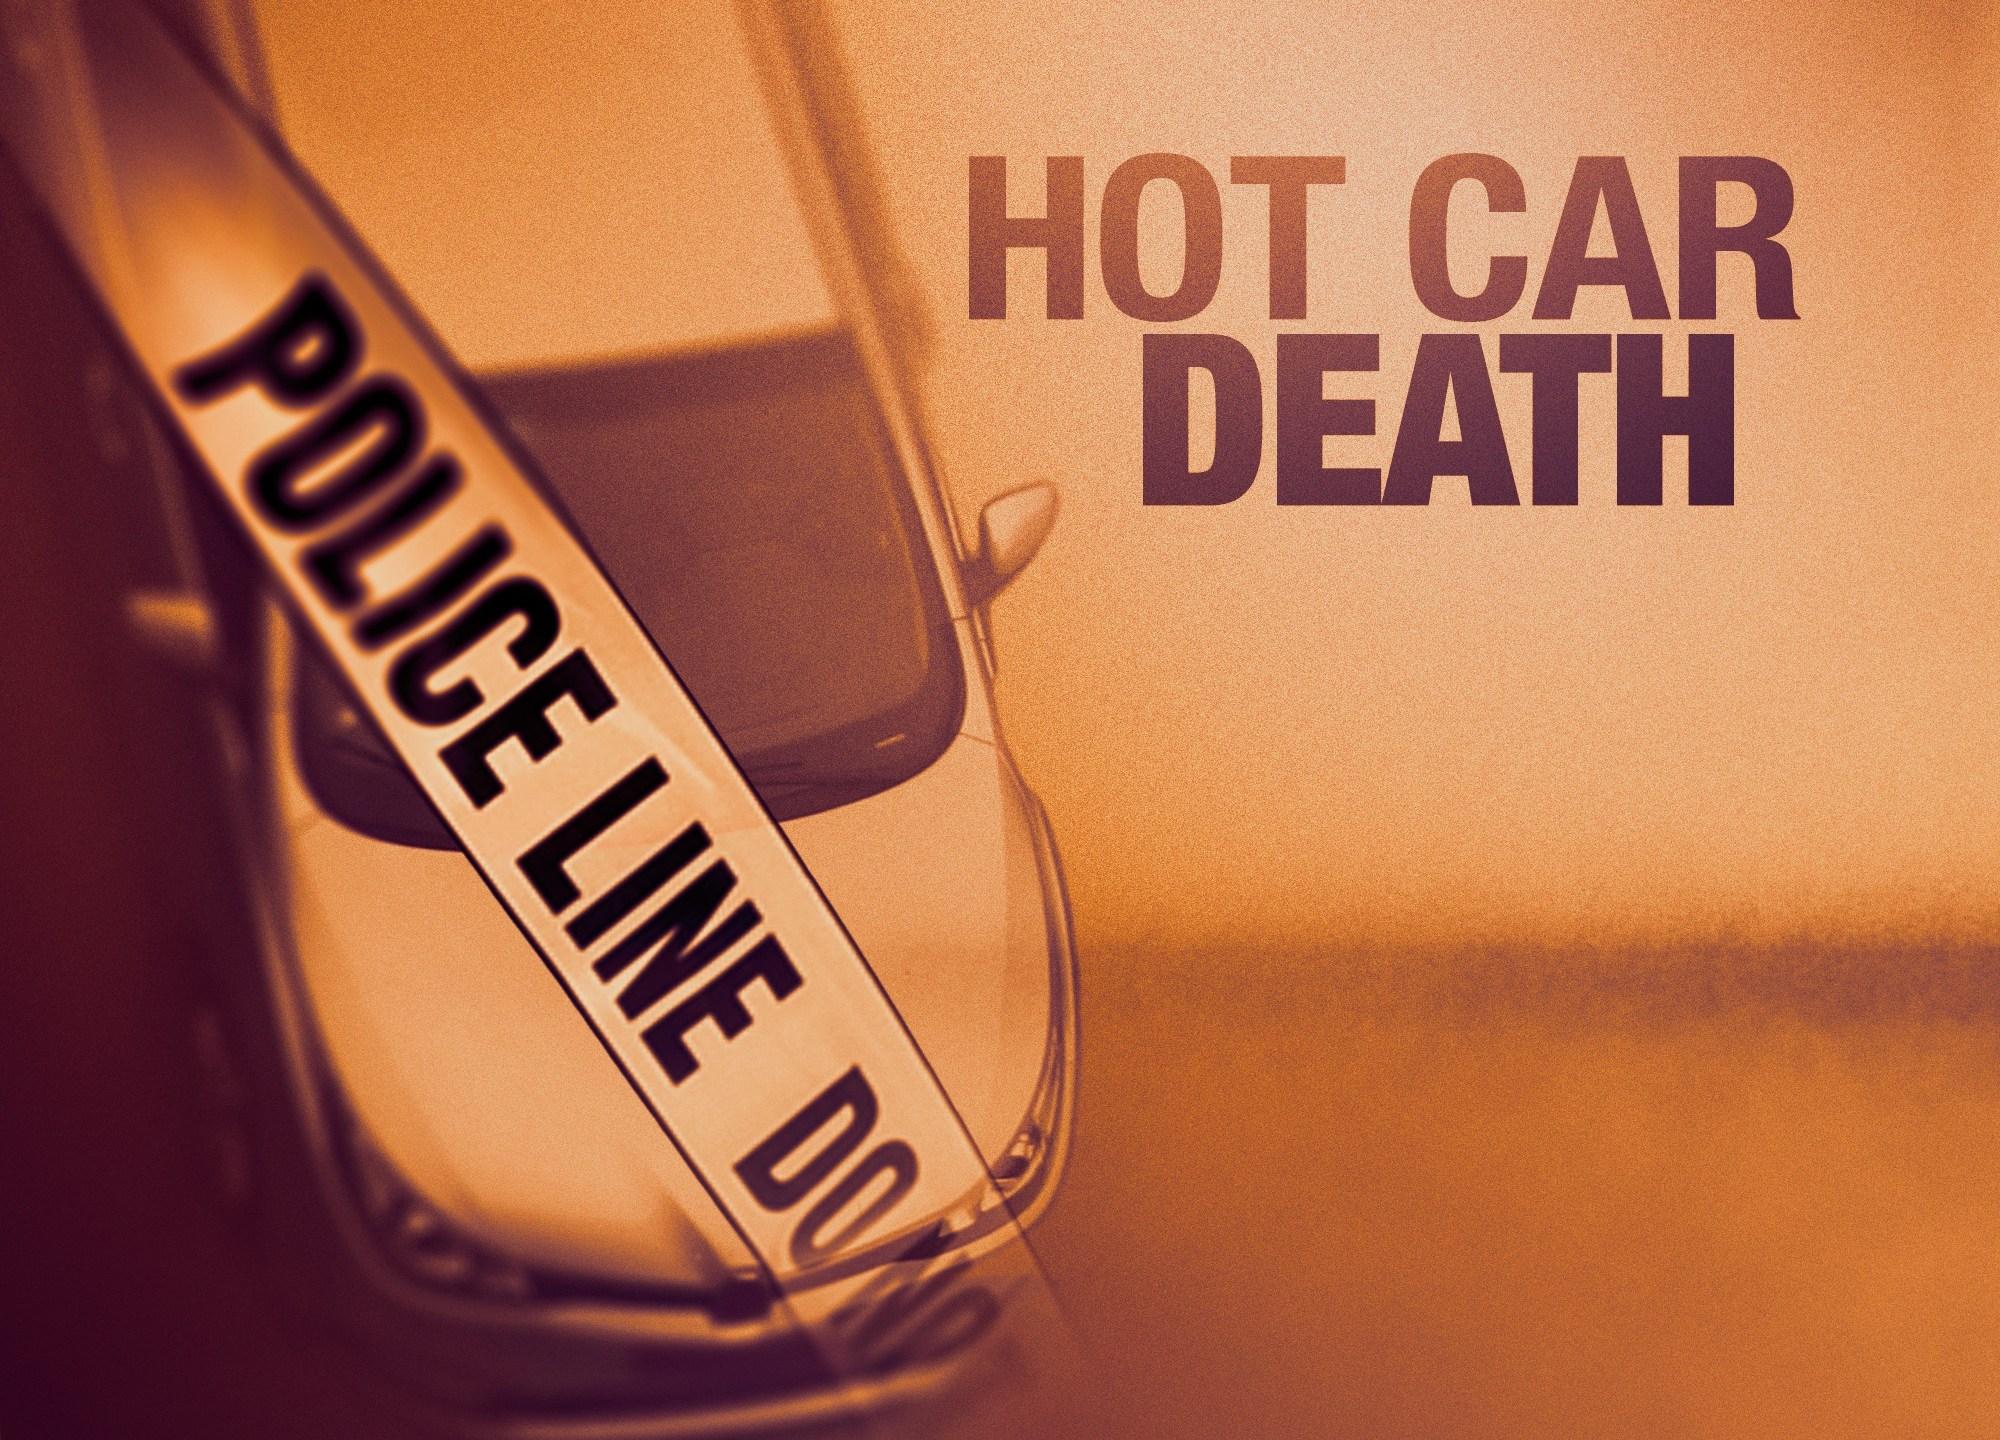 hot-car-death-ap_224180